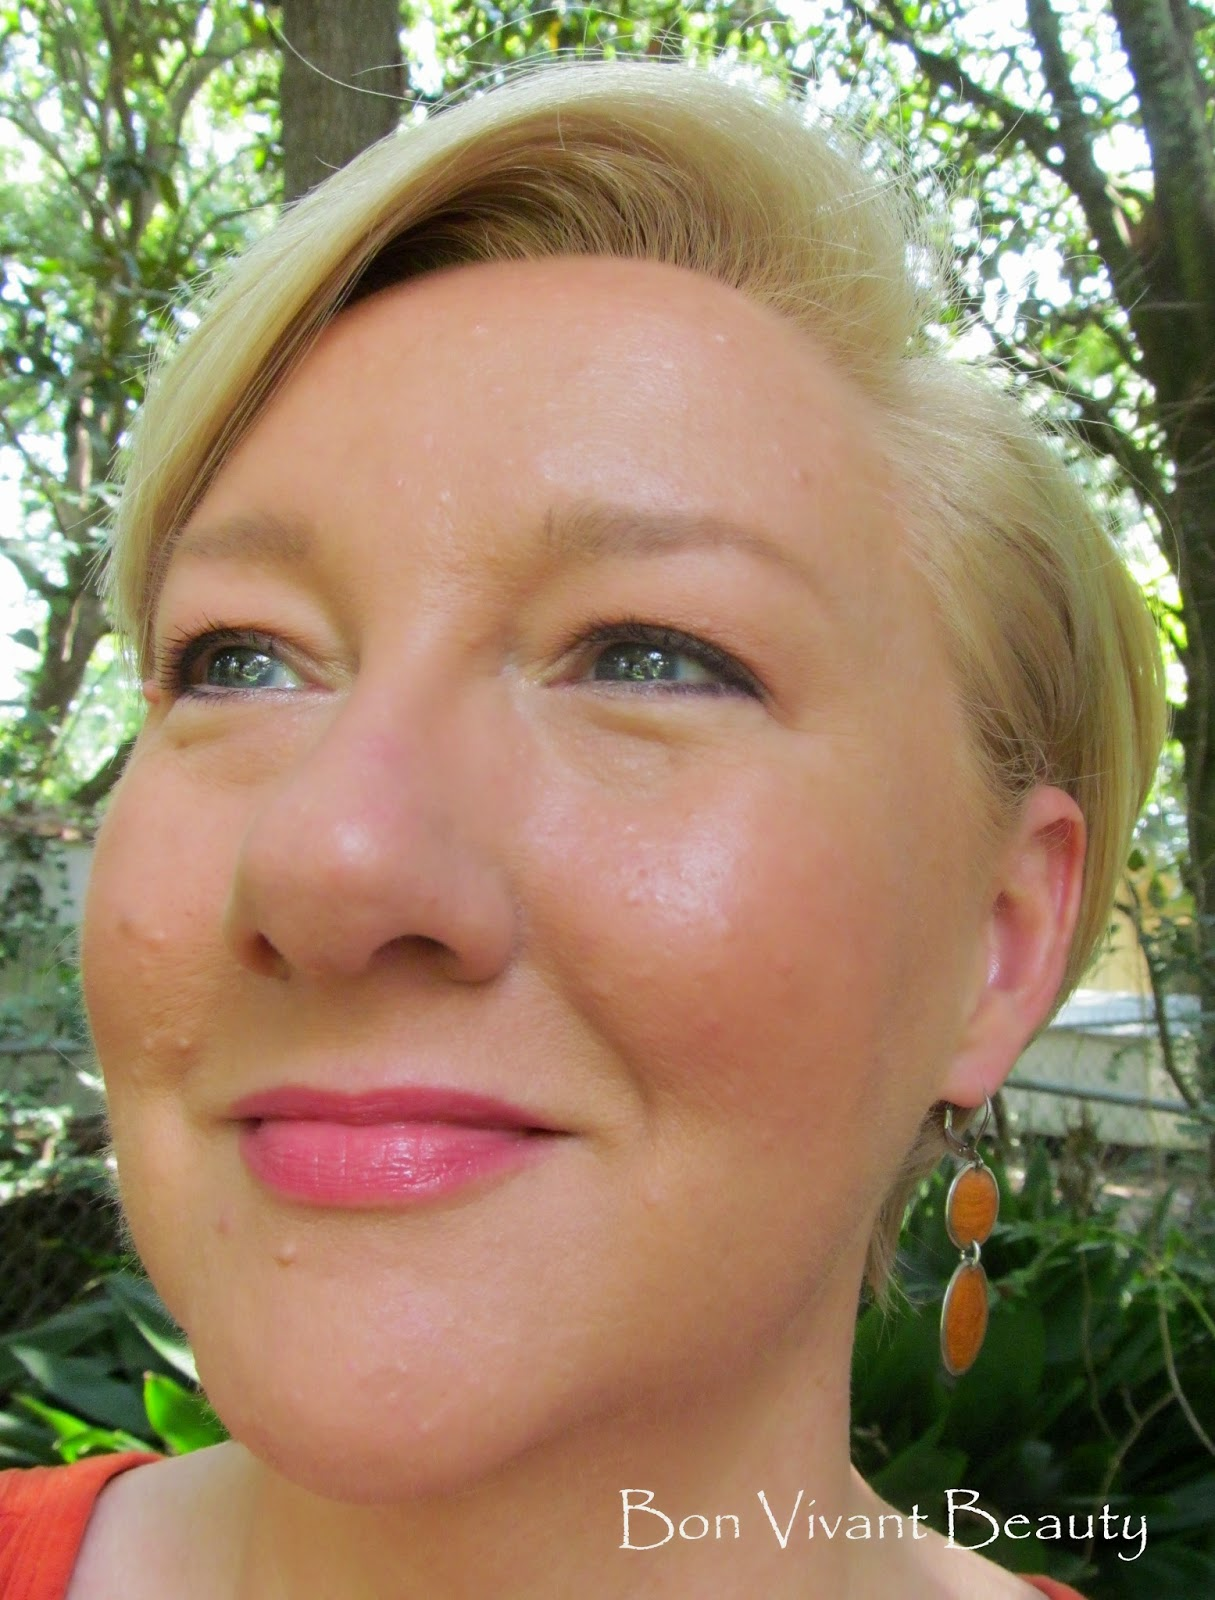 Bon Vivant Beauty: Fizzies & Little Susie Butter Lipsticks ...